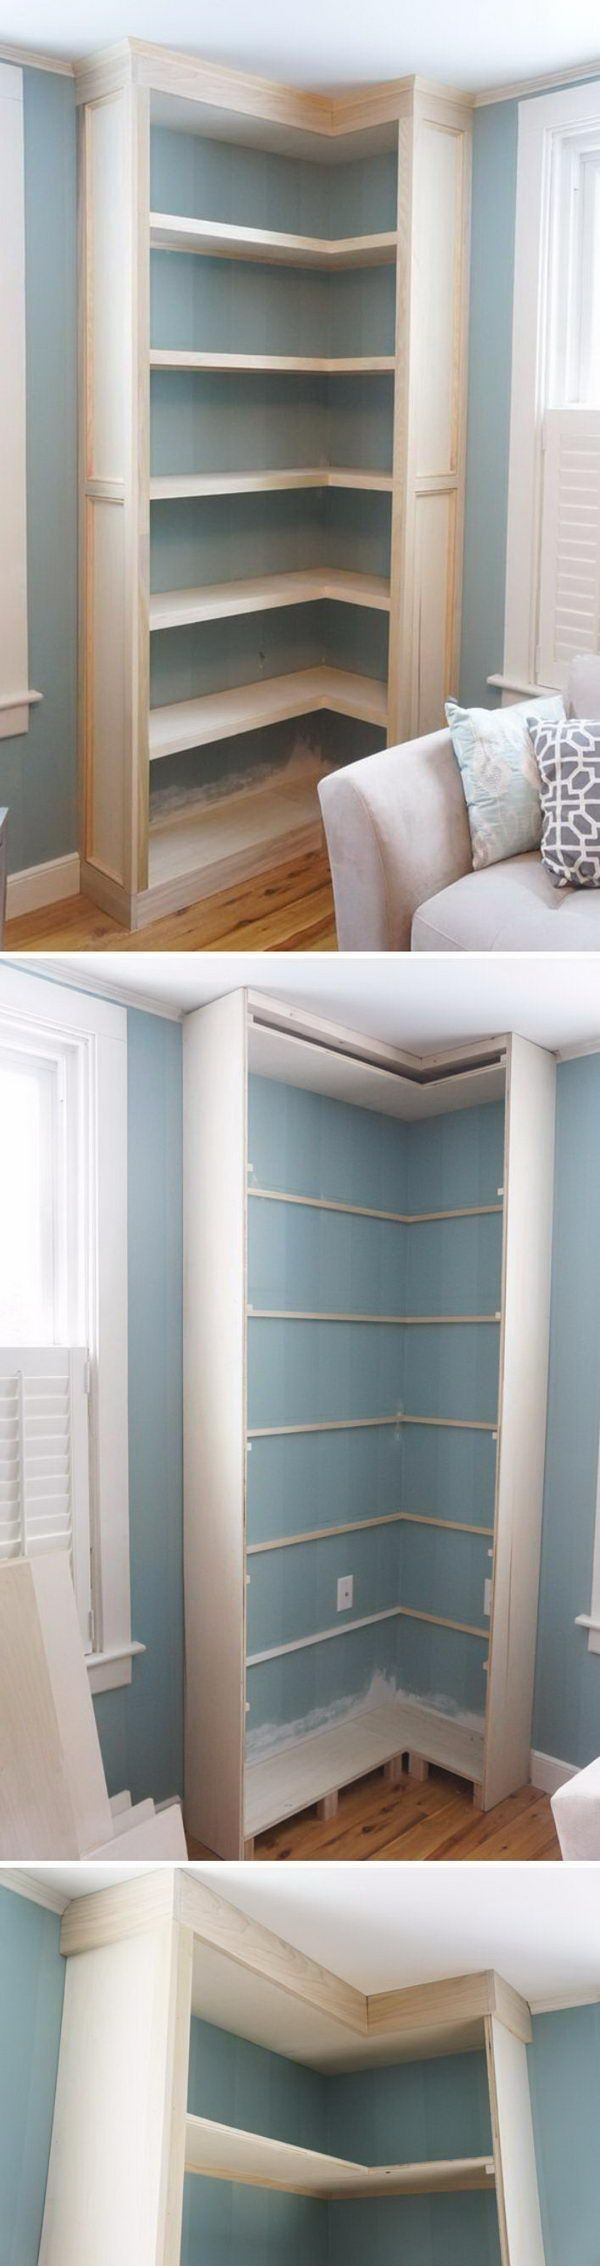 Newest Corner Shelves Design Ideas For Home Decor Looks Beautiful09